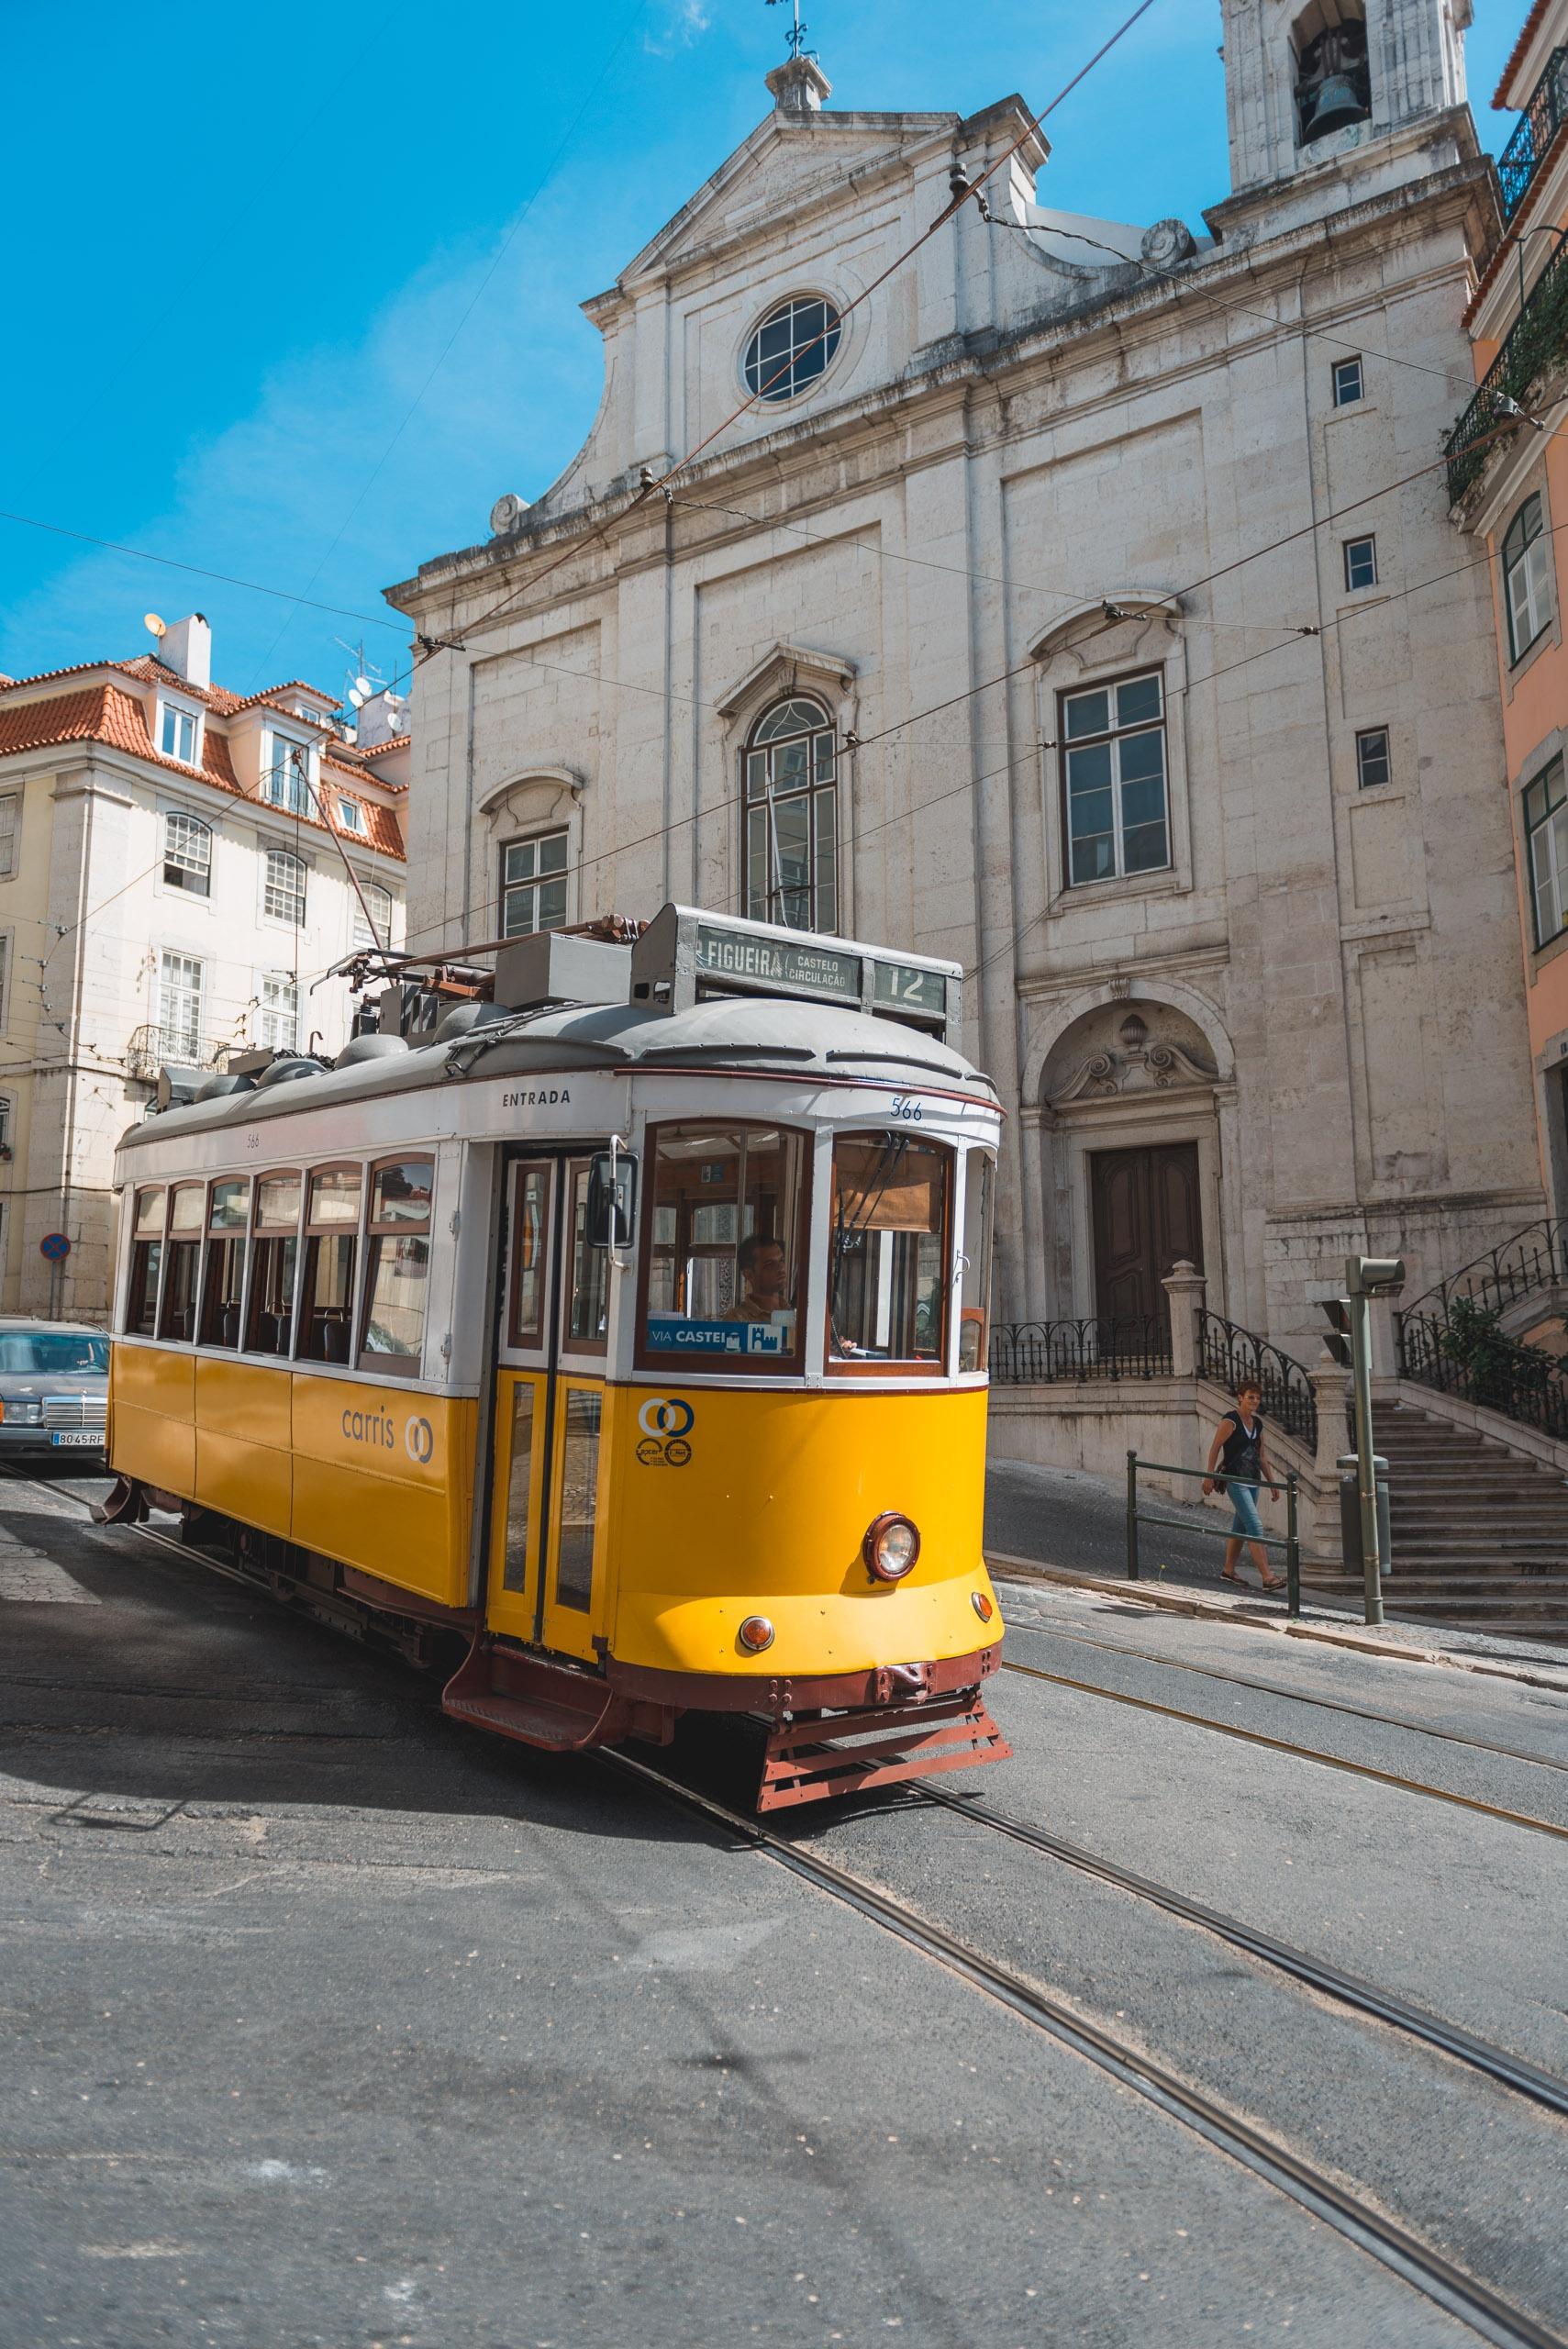 Portugal - Lisbon - 2012-0921-DSC_1368_97894